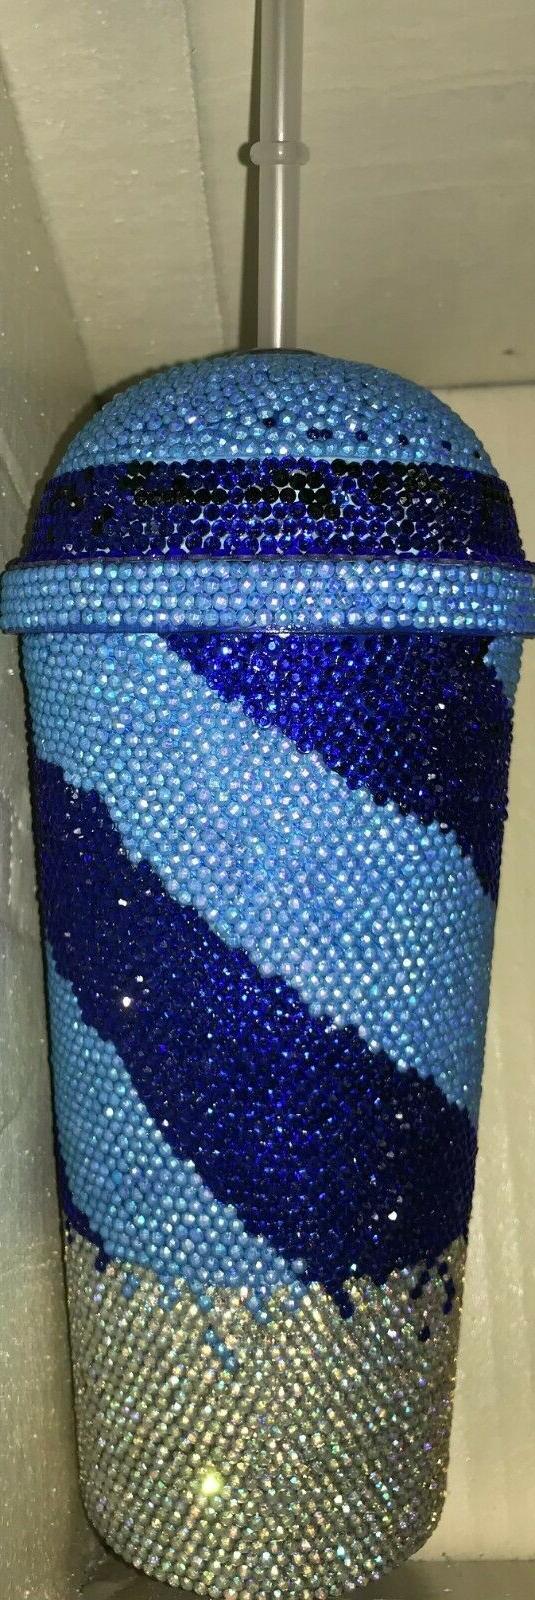 Custom Bling Tumbler Cup oz Swirl Personalized